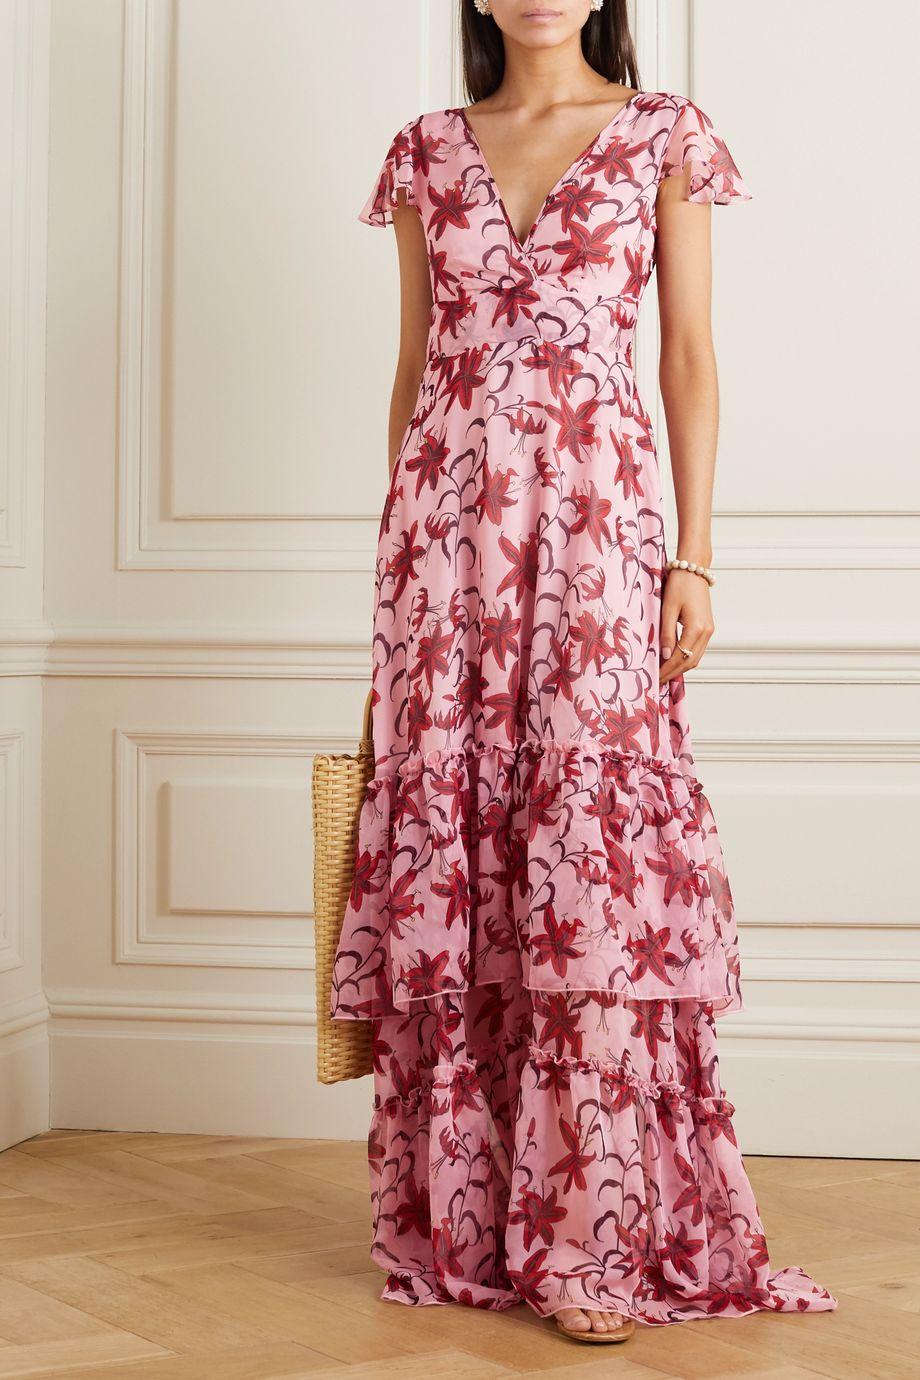 Eywasouls Malibu Kimi tiered ruffled floral-print chiffon dress